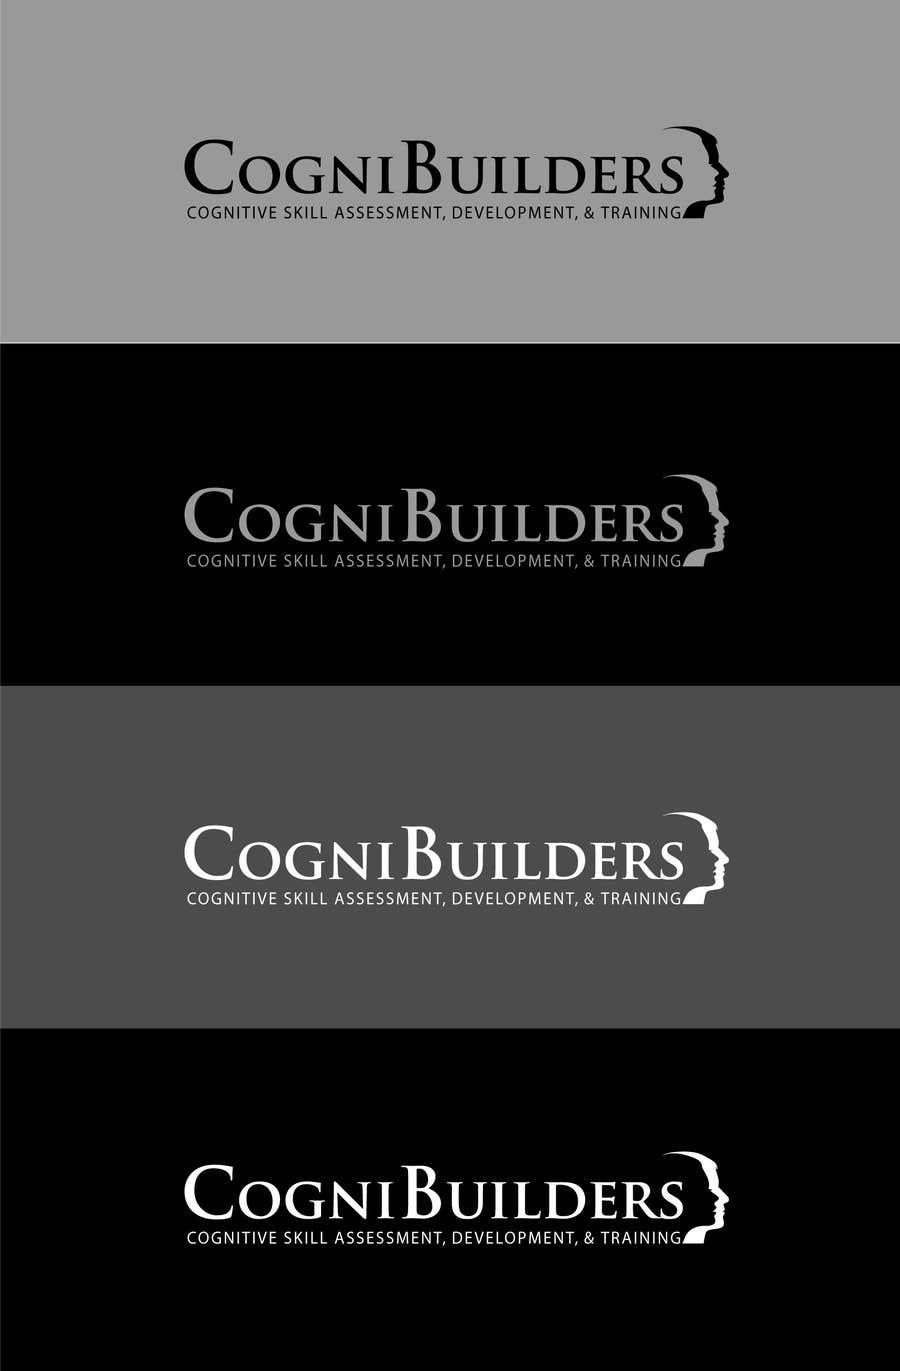 Penyertaan Peraduan #                                        81                                      untuk                                         Design a Logo for Cognibuilders